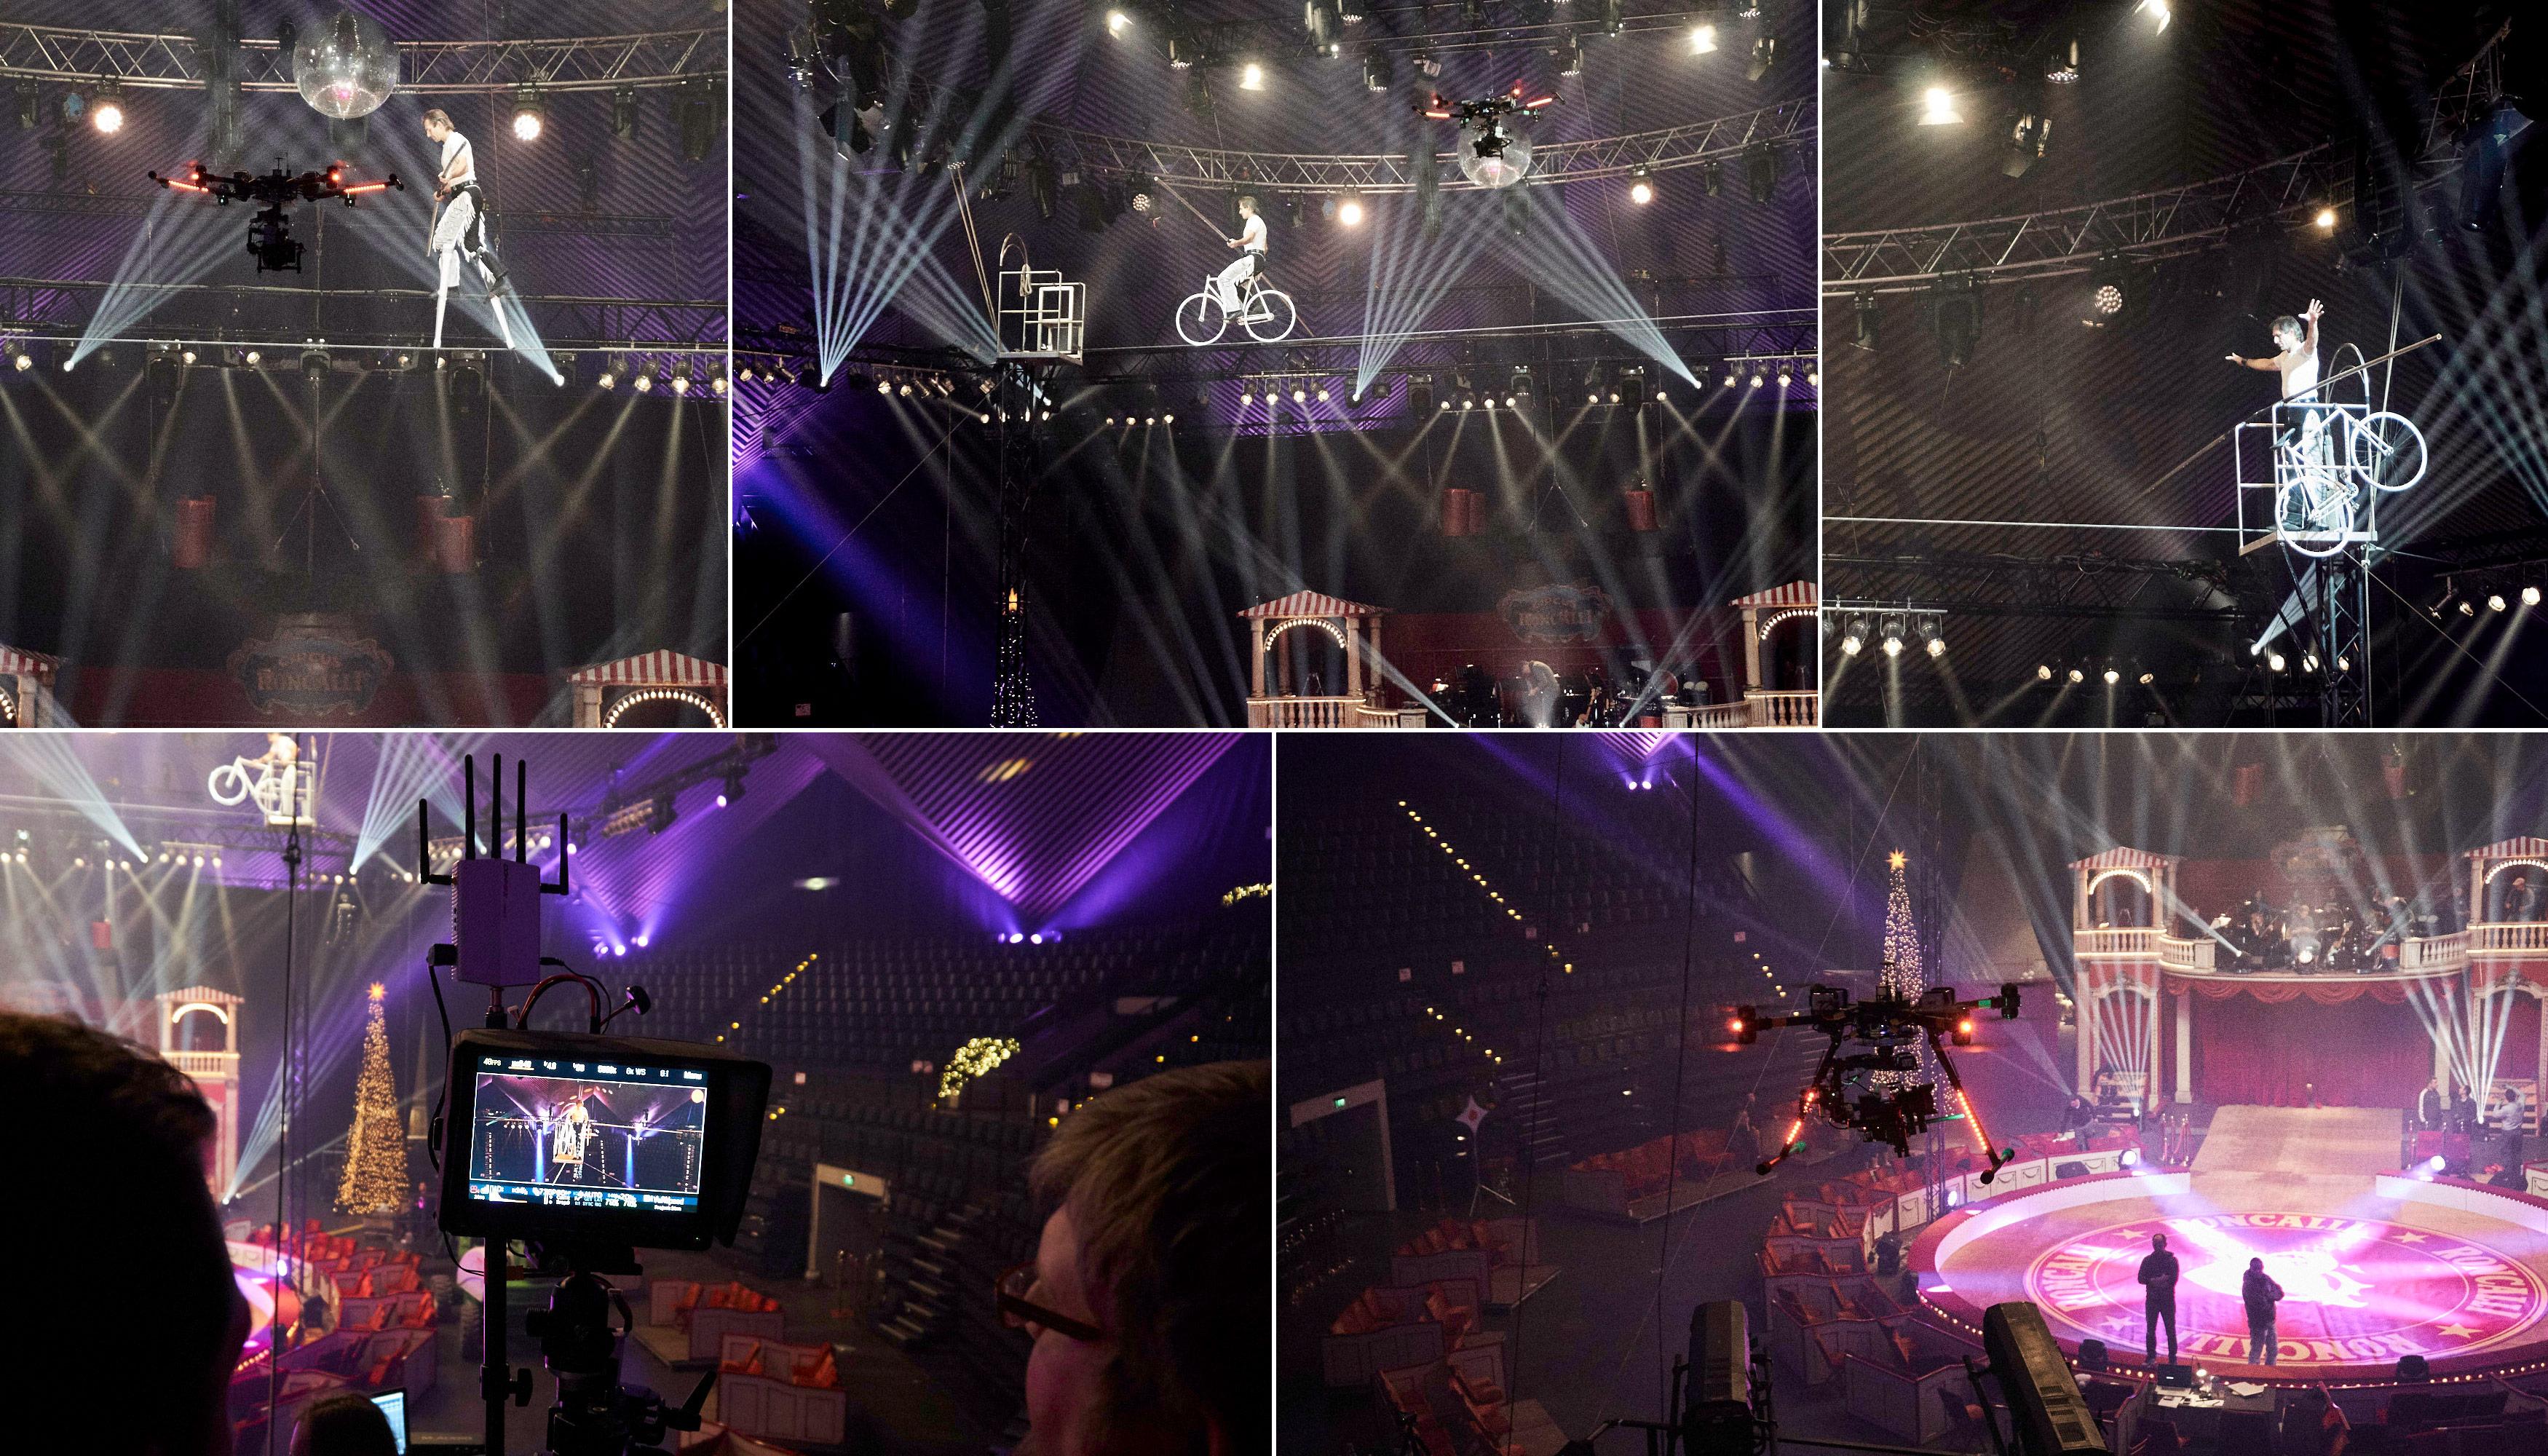 Stereoscreen, Freddy Nock, Circus Roncalli, Making of